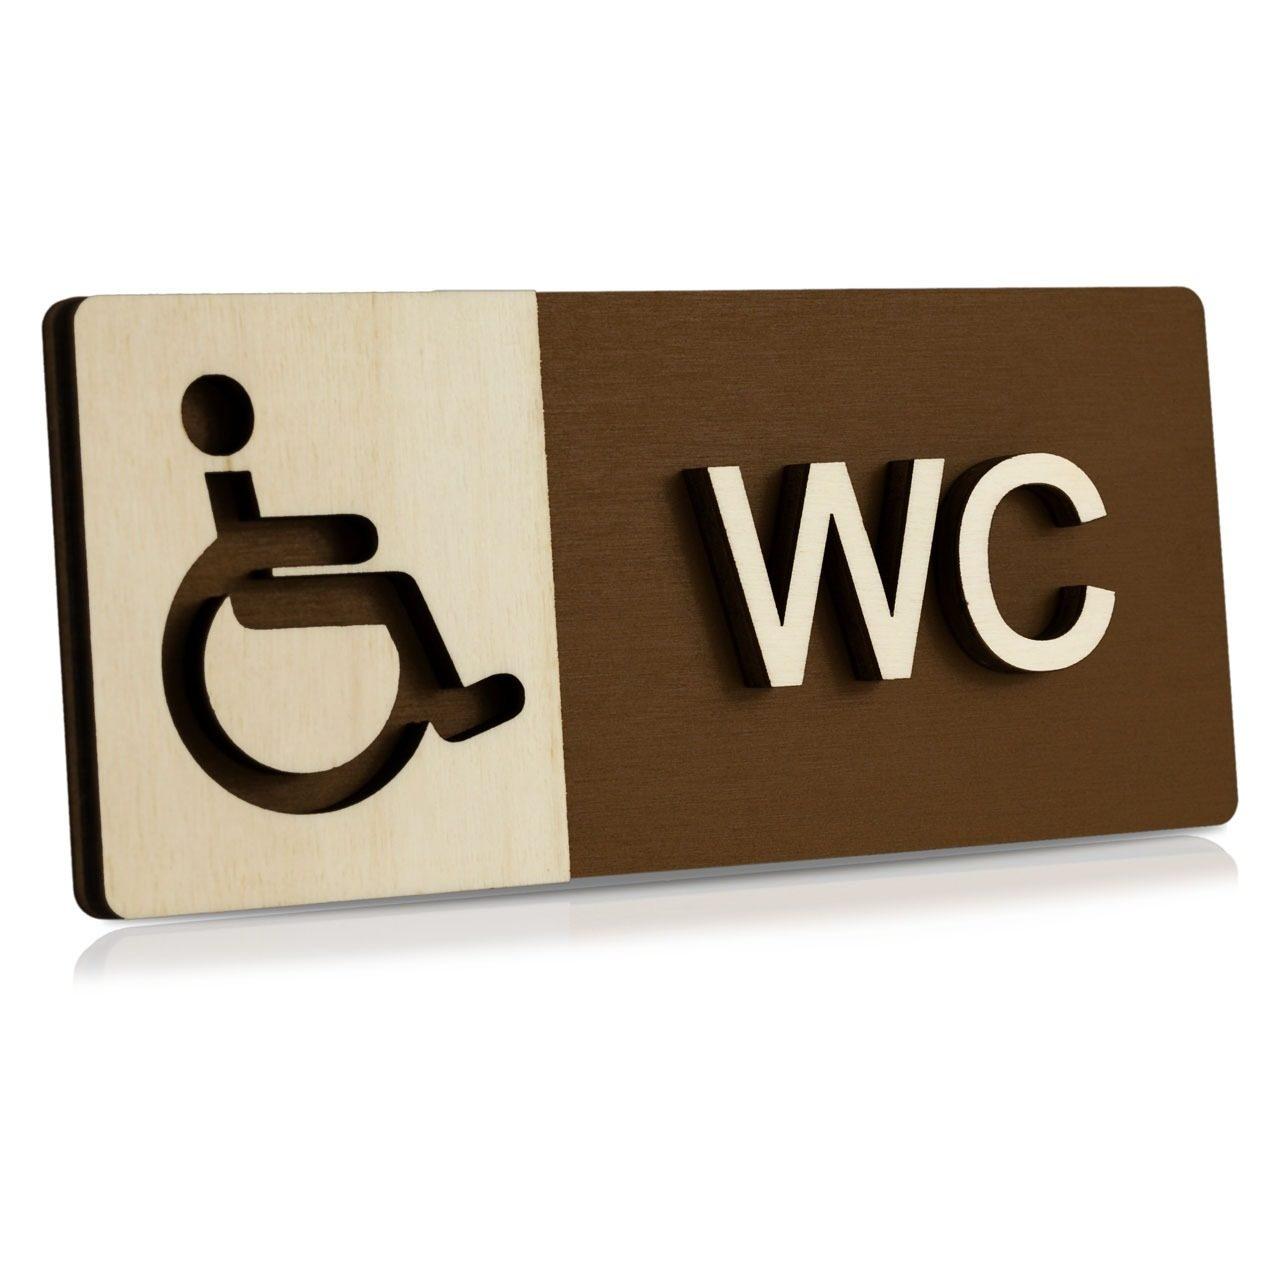 "Holz-Türschild (Schokobraun) ""Behinderten-WC"""